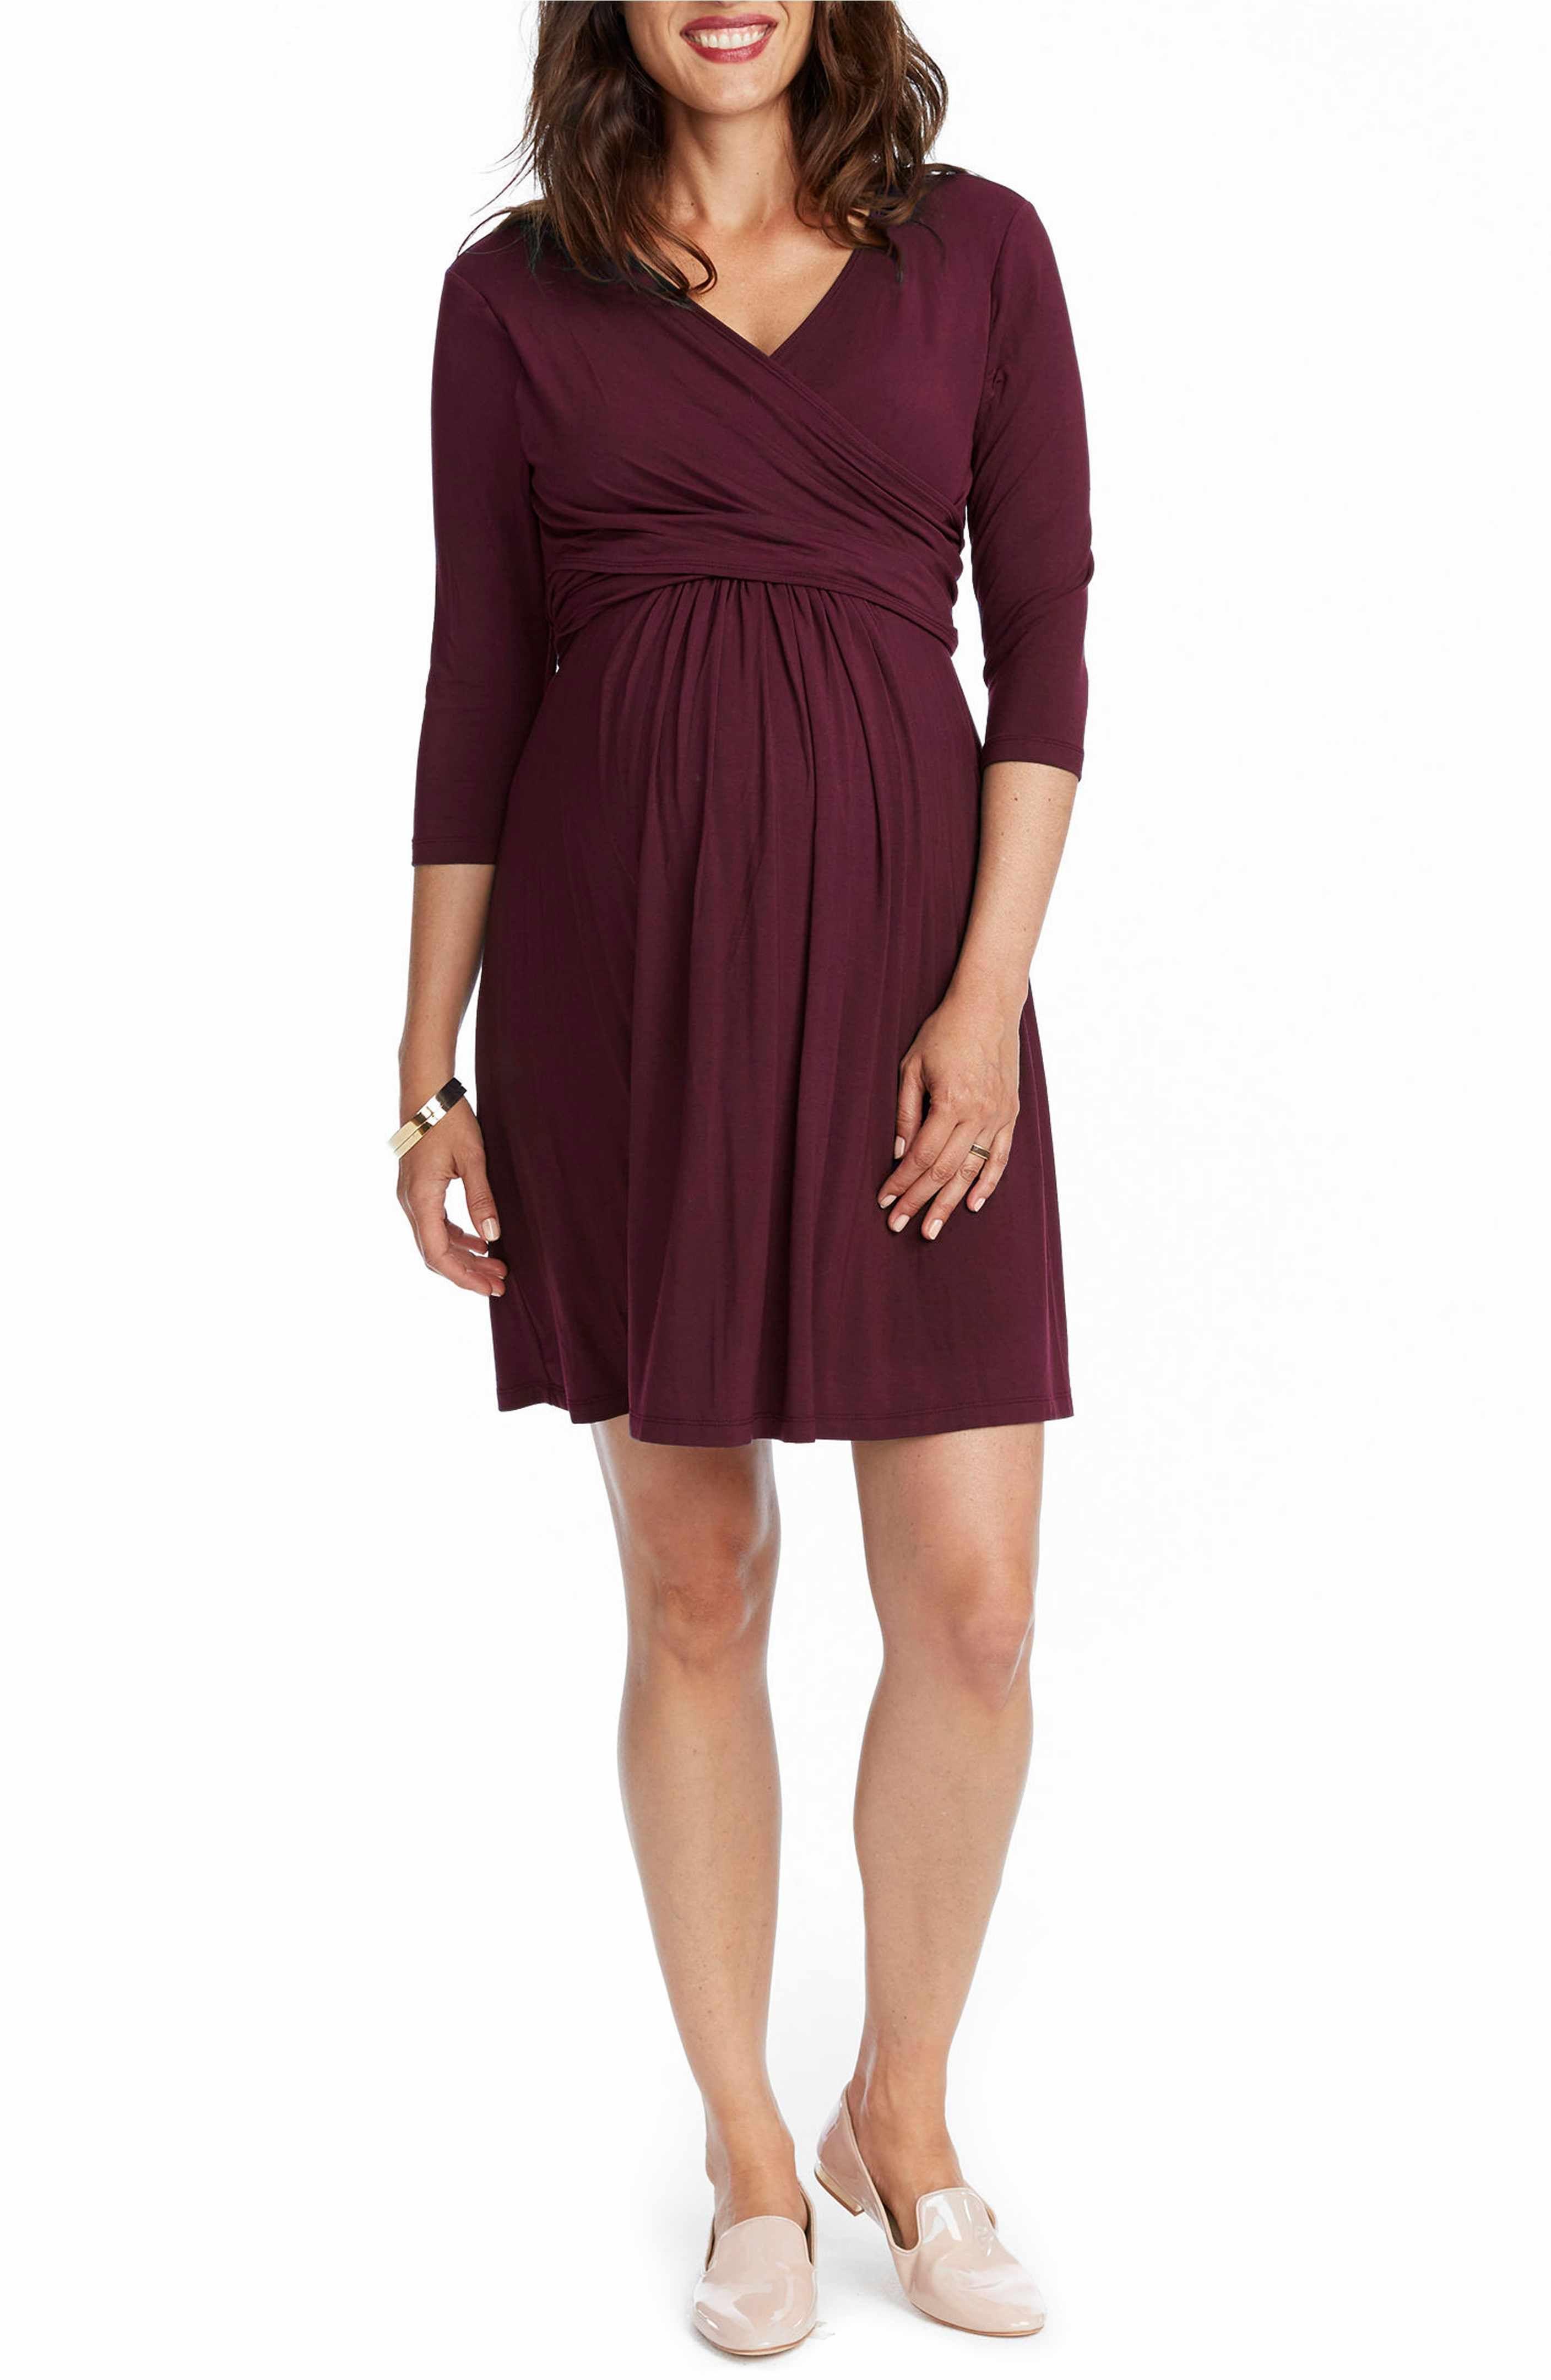 Rosie Pope Maternity Nursing Wrap Dress Nordstrom Burgundy Dress Dresses Rosie Pope Maternity [ 4320 x 2816 Pixel ]